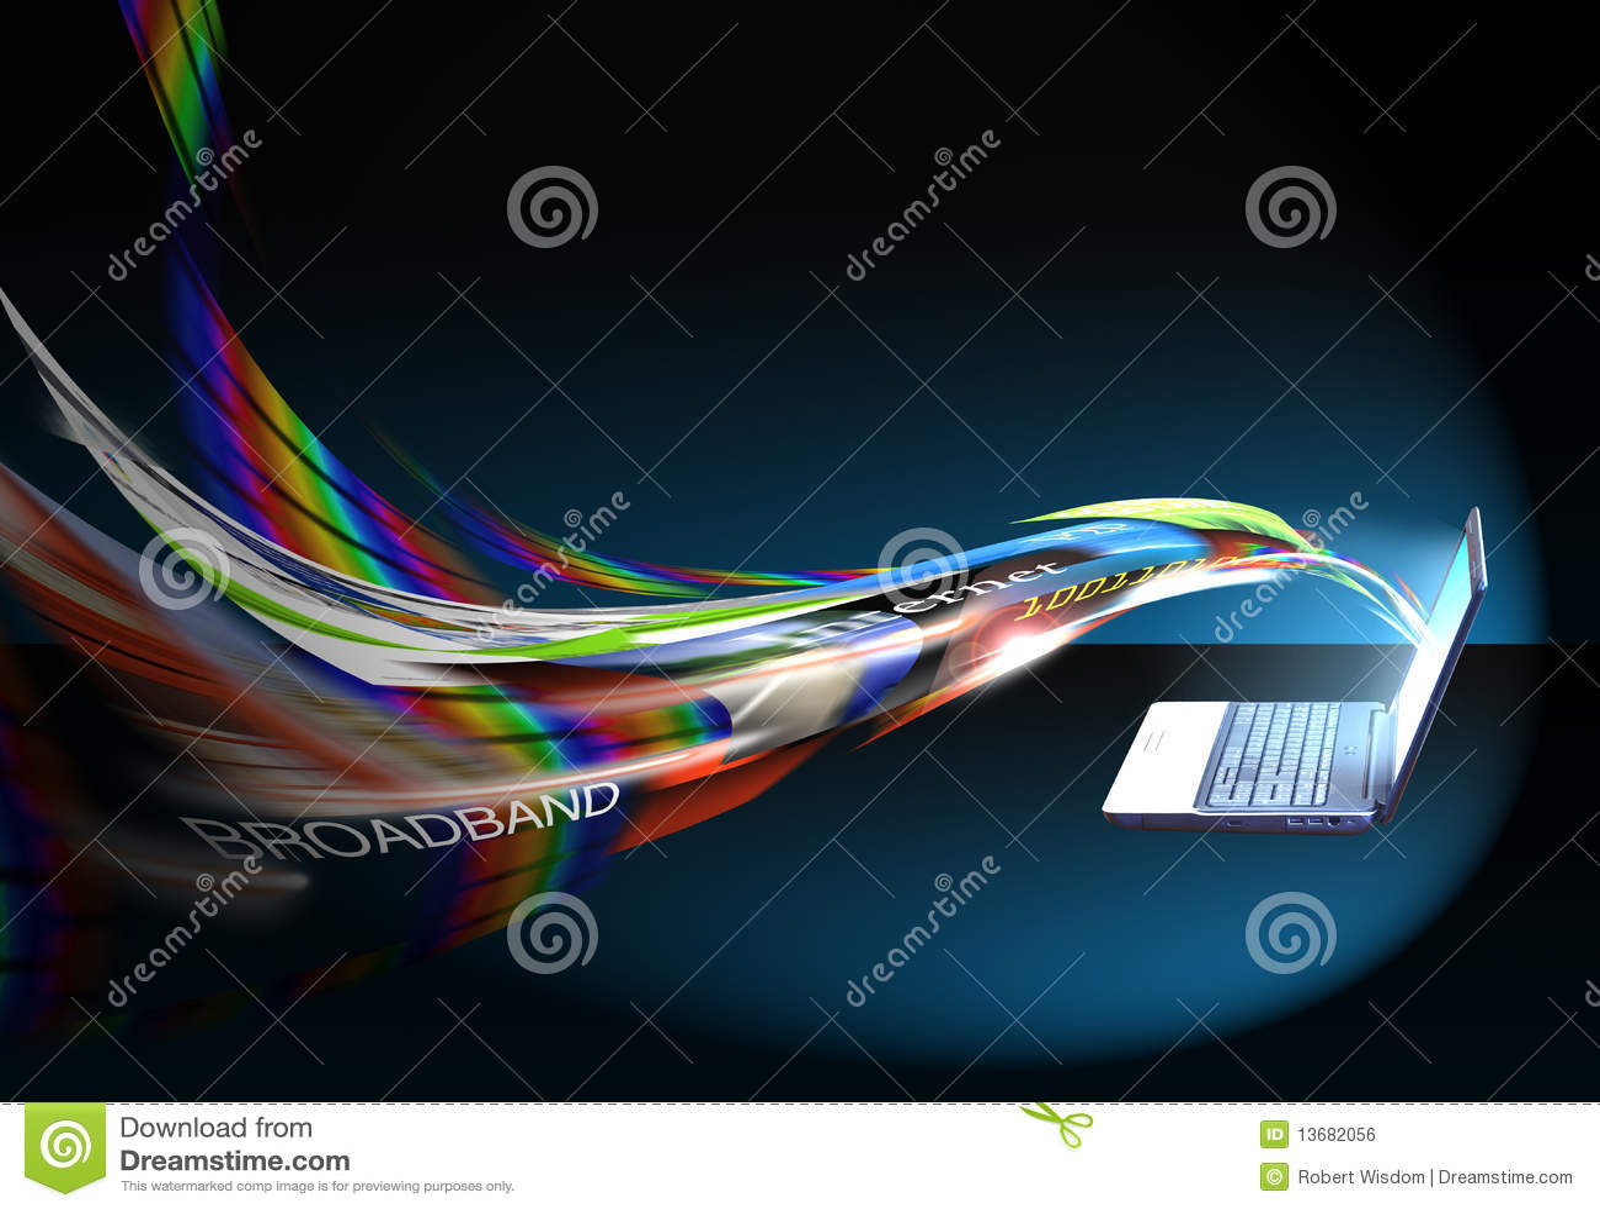 Internet-Drehzahl/Breitband